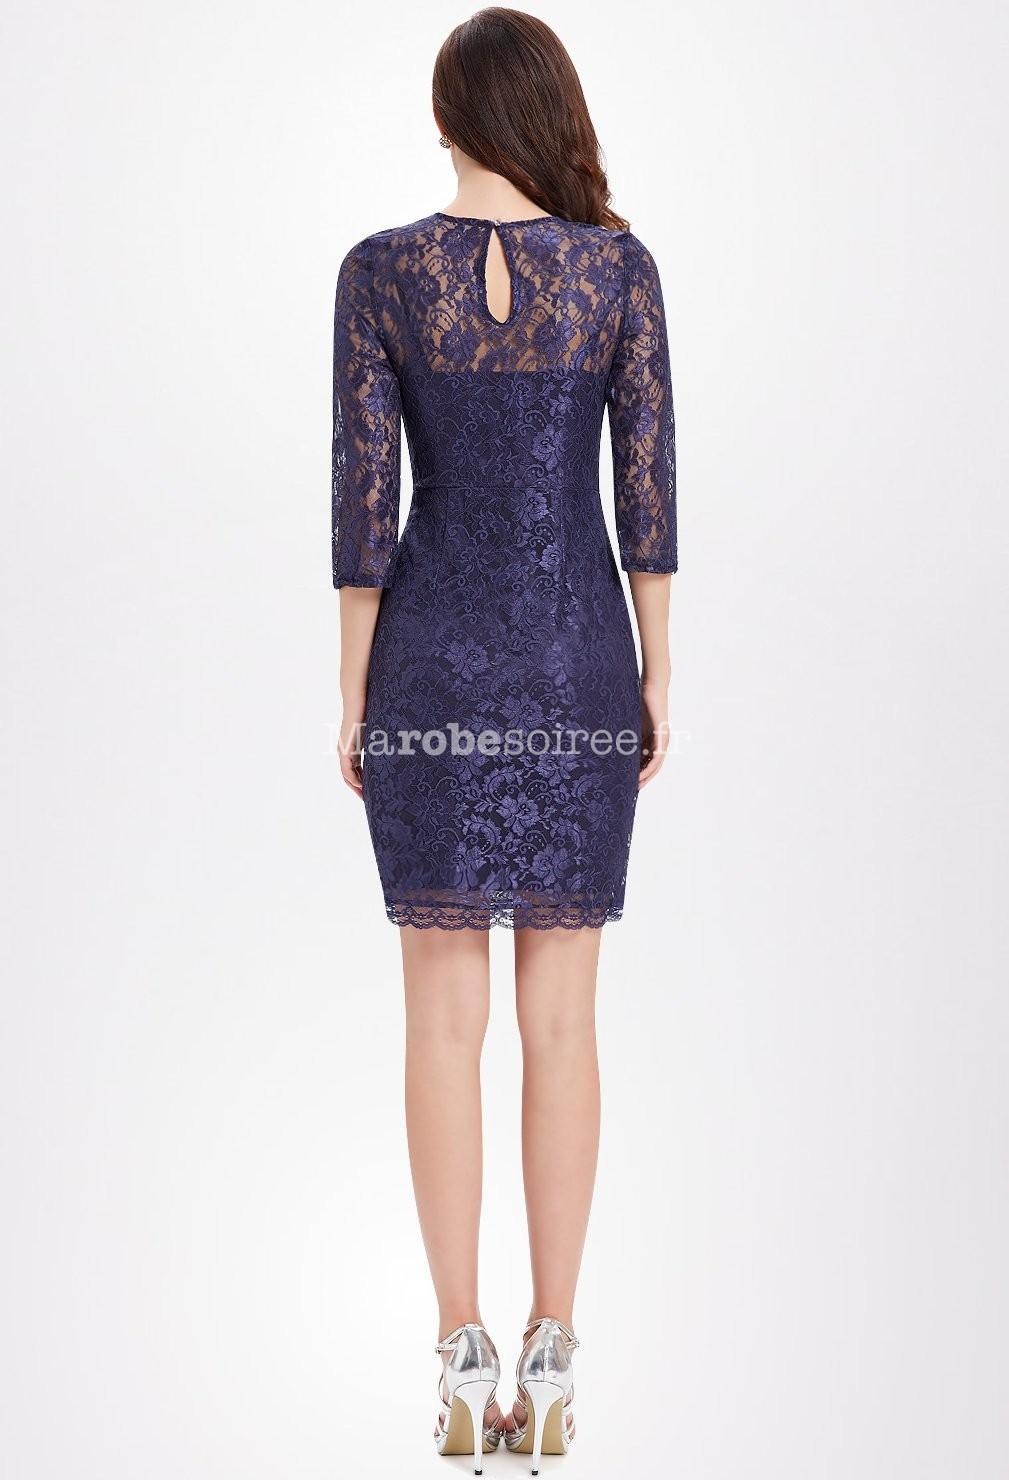 robe courte en dentelle bleu avec manches. Black Bedroom Furniture Sets. Home Design Ideas